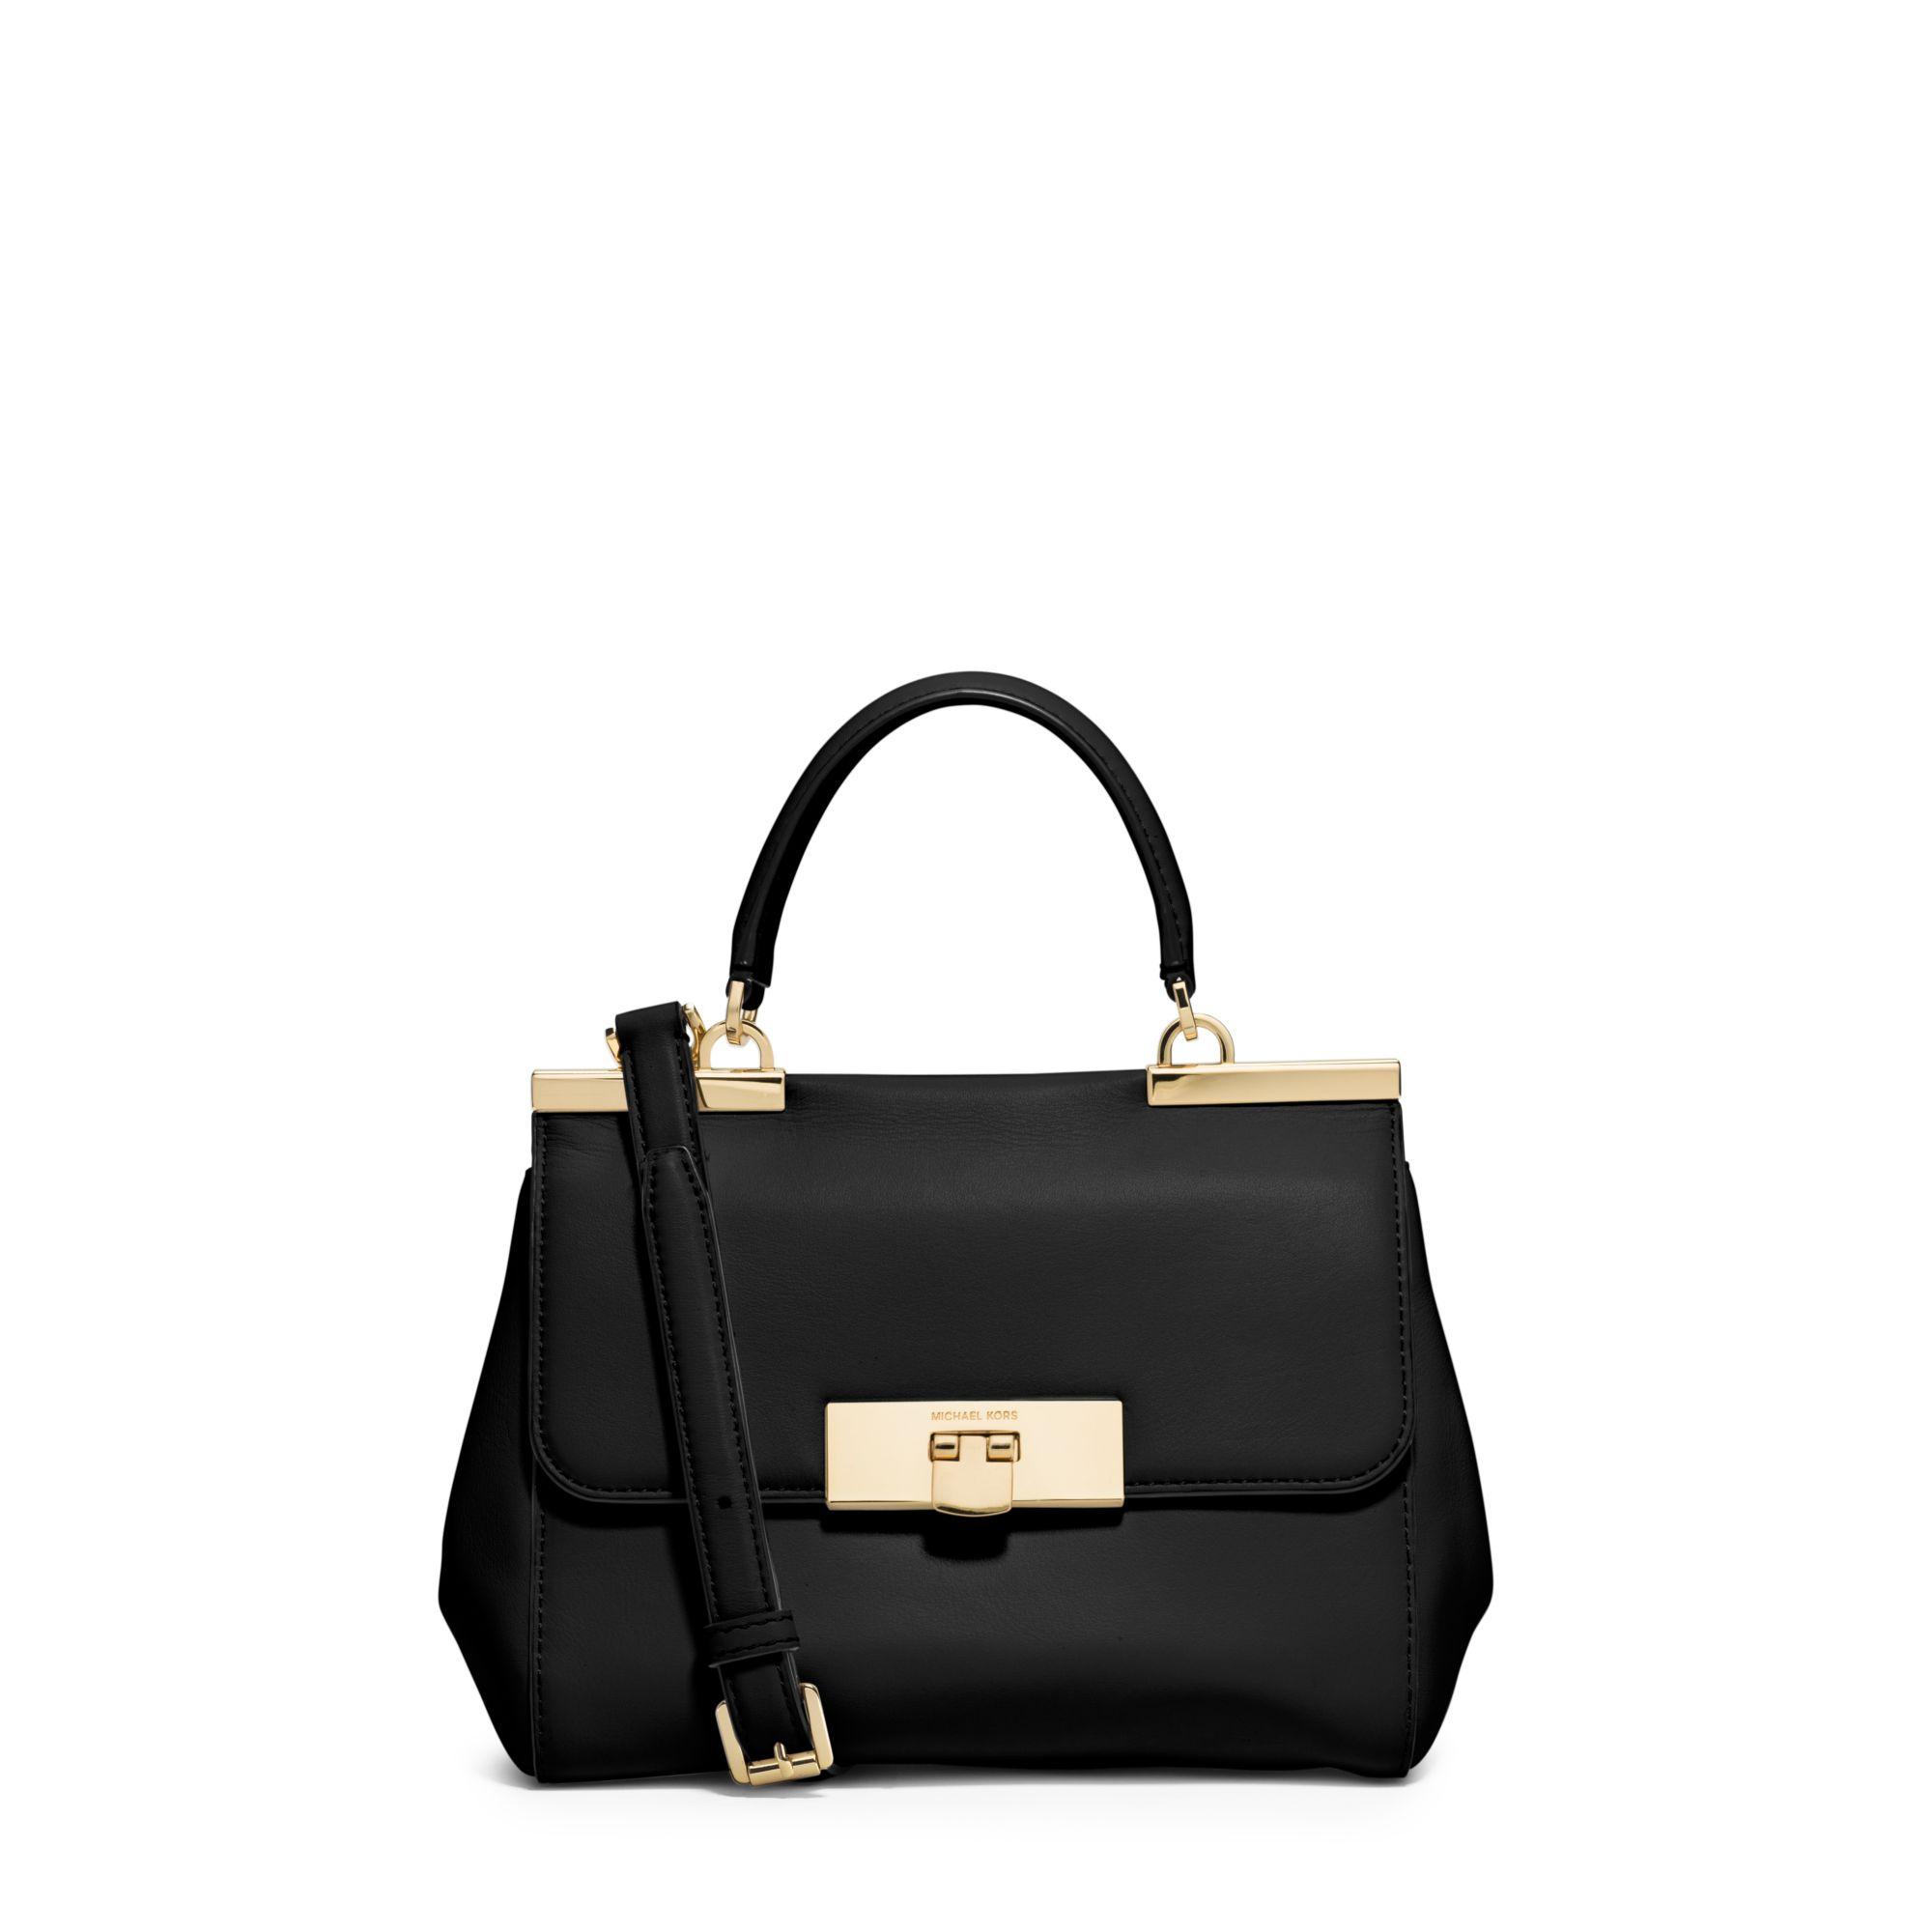 d116e3d4d8 ... where to buy lyst michael kors marlow small leather satchel in black  5af0d 0de9d ...